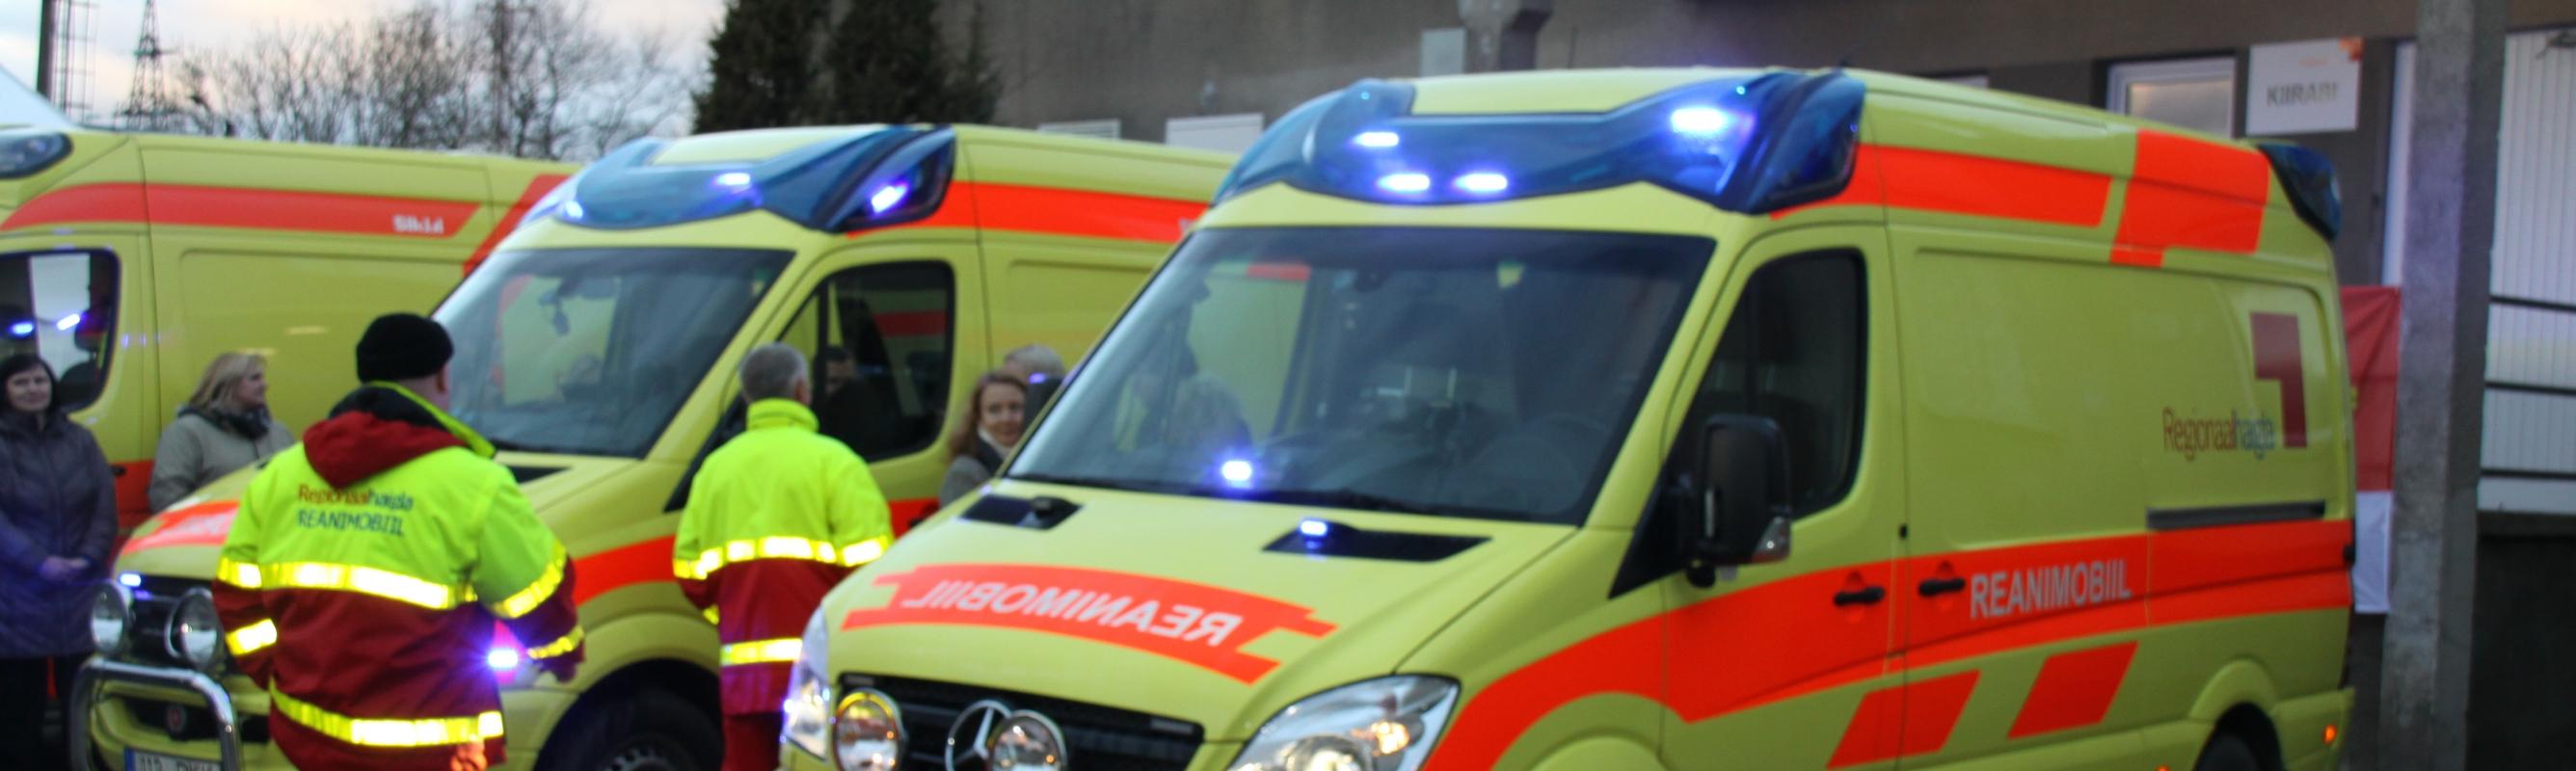 Kiirabi tugipunkti avamine Jüris 30.12.2013